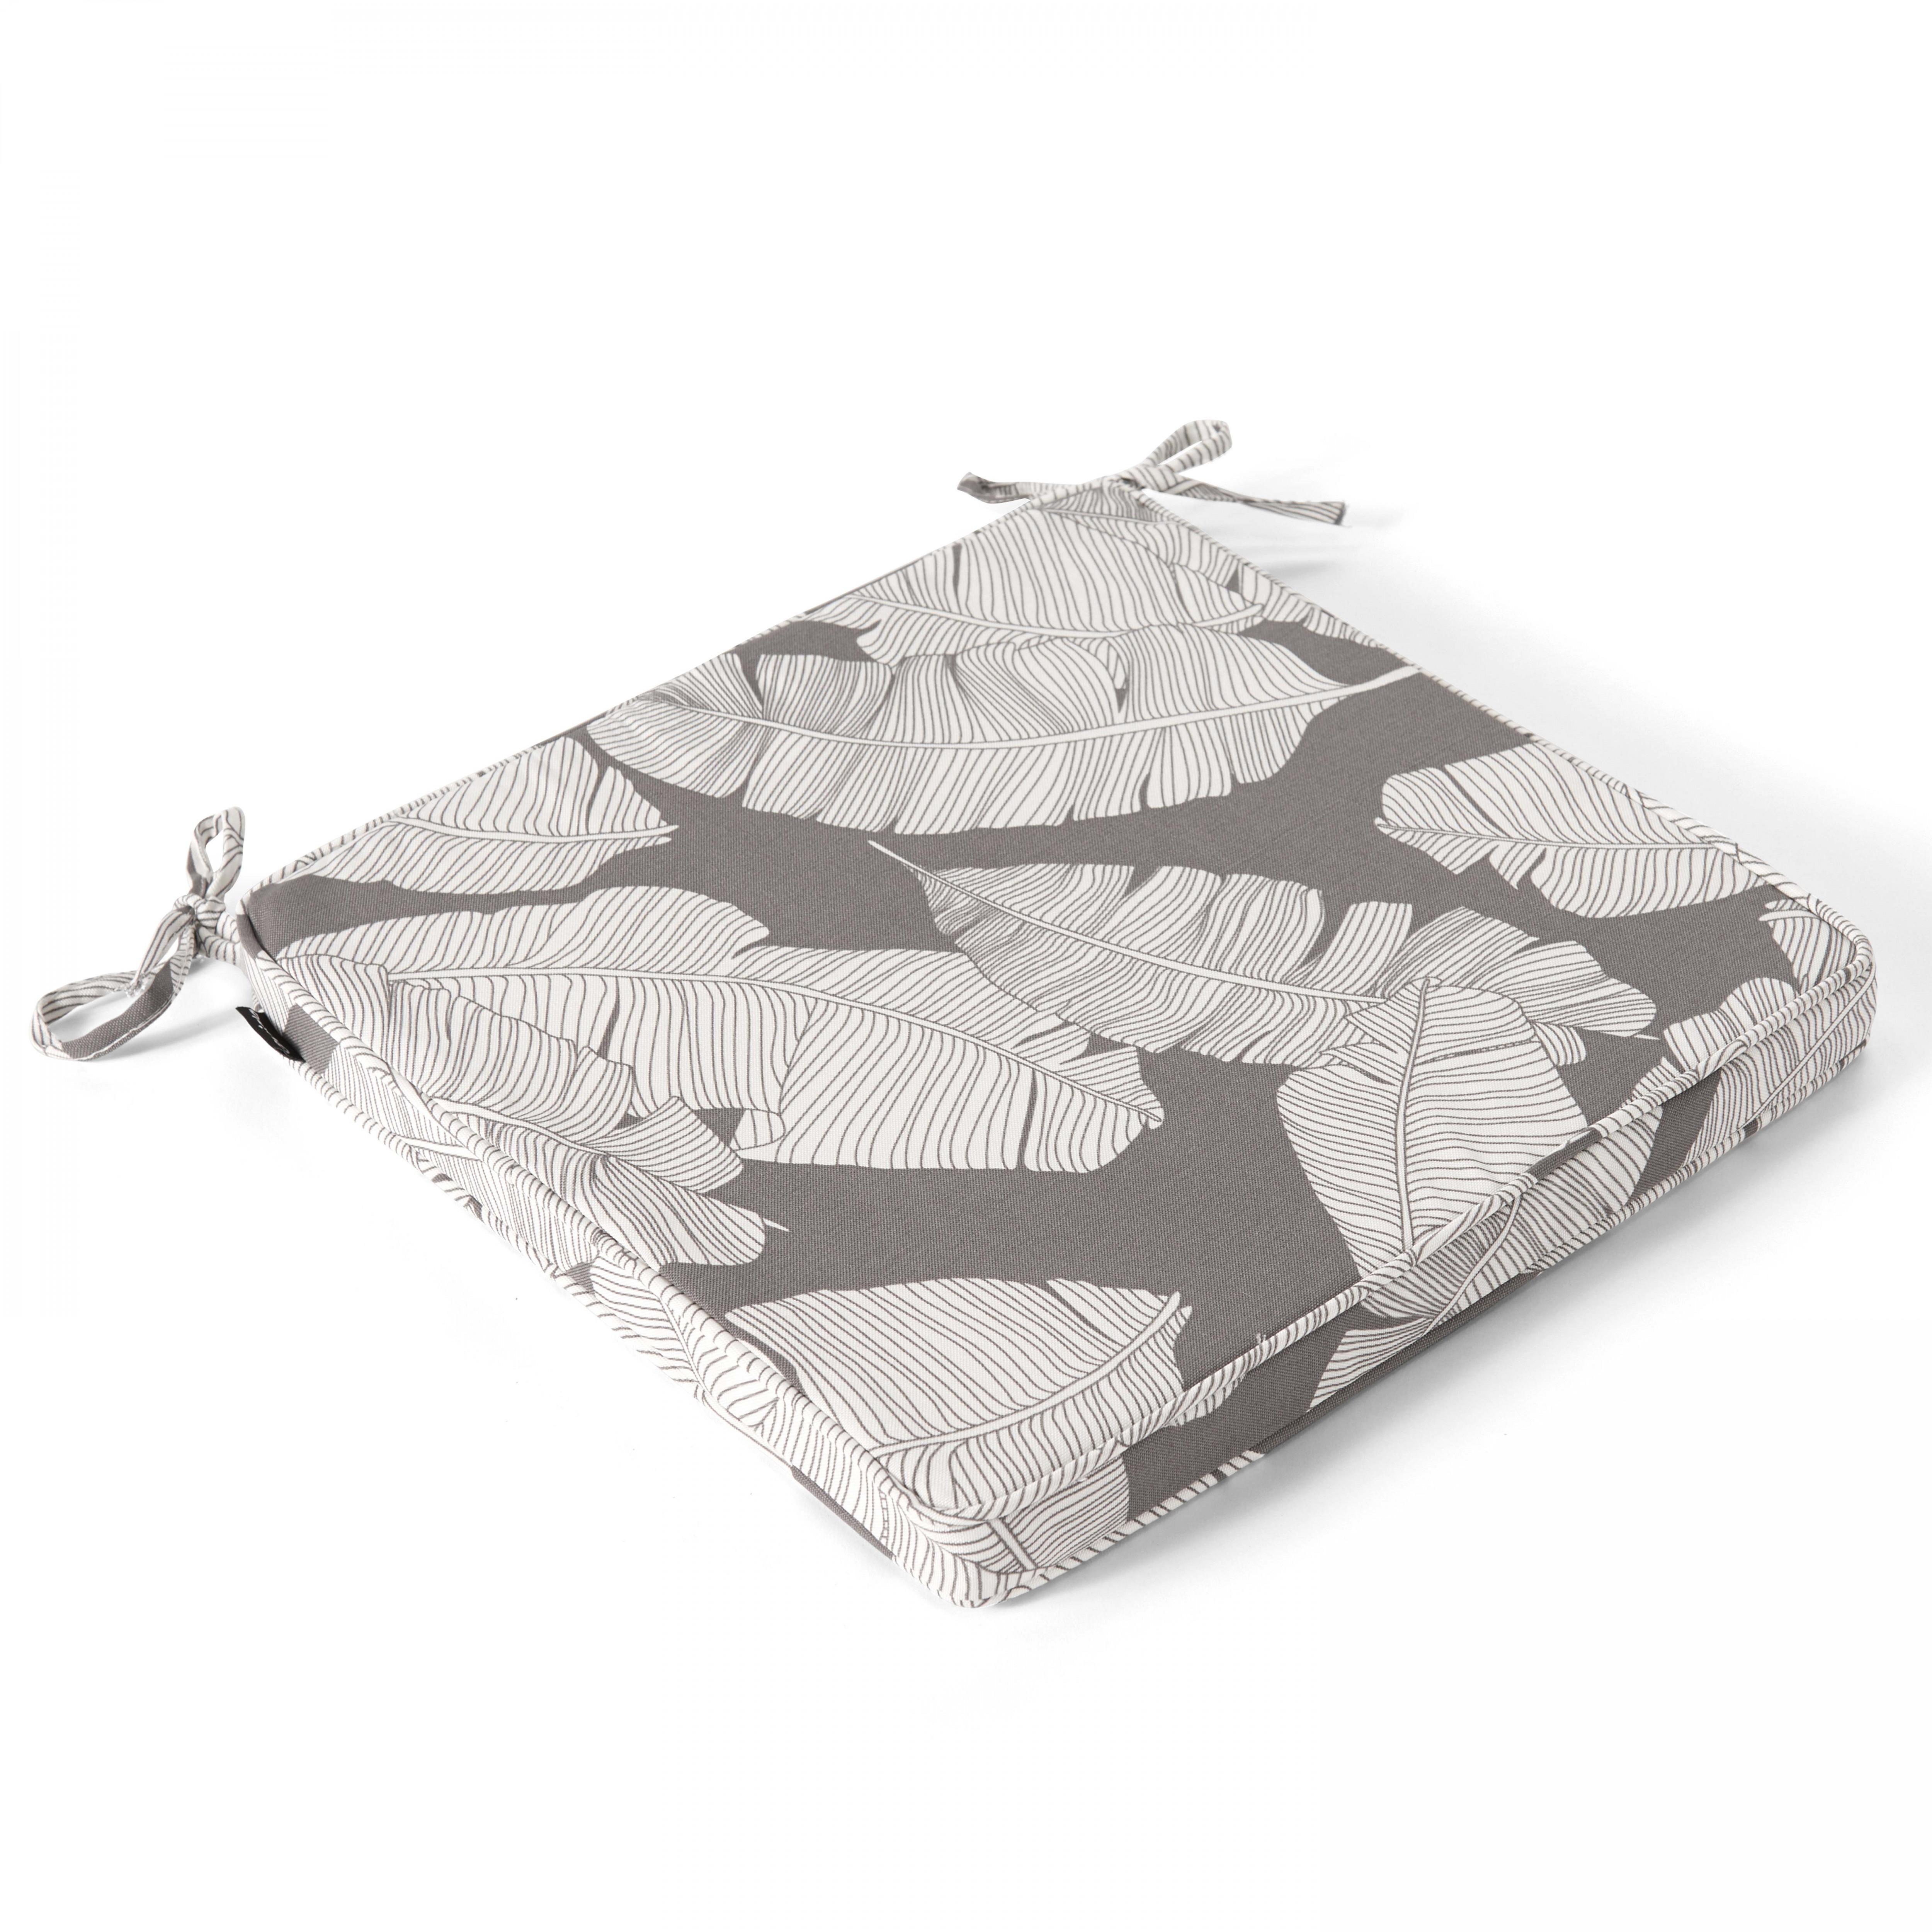 Coussin d'assise en polyester gris